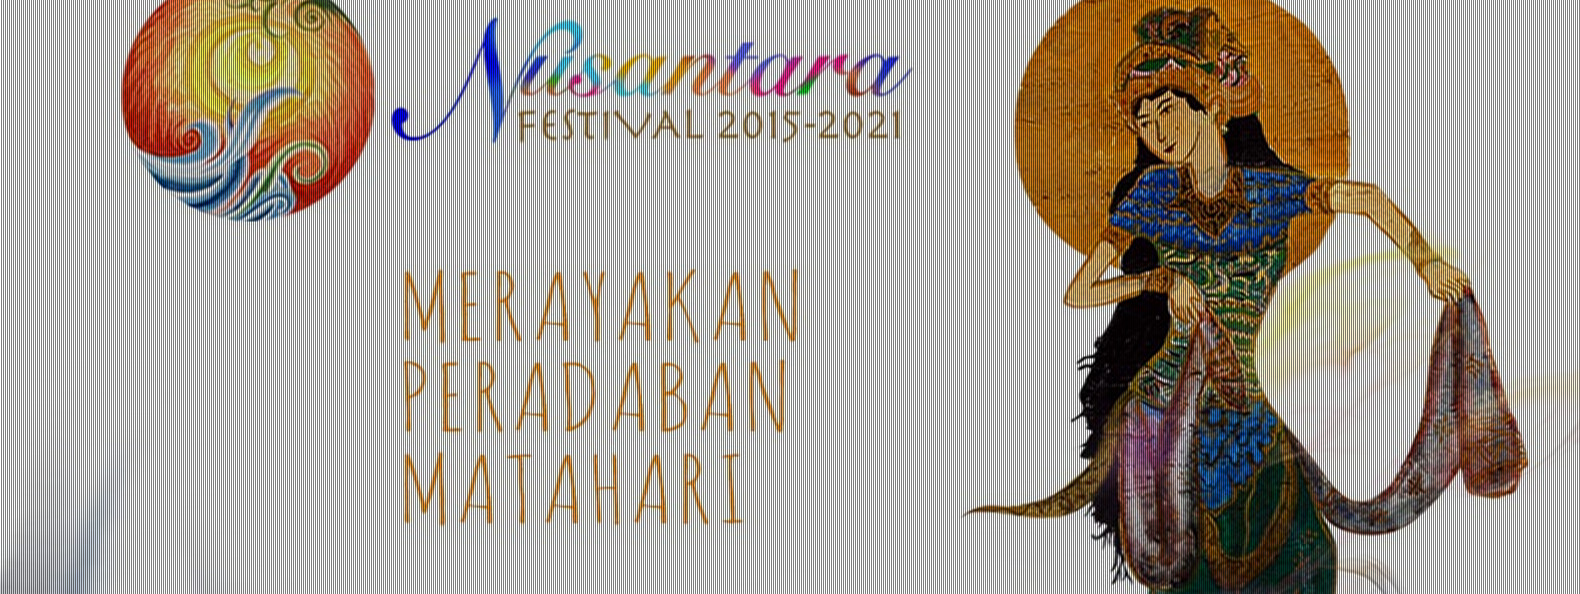 Nusantara Festival